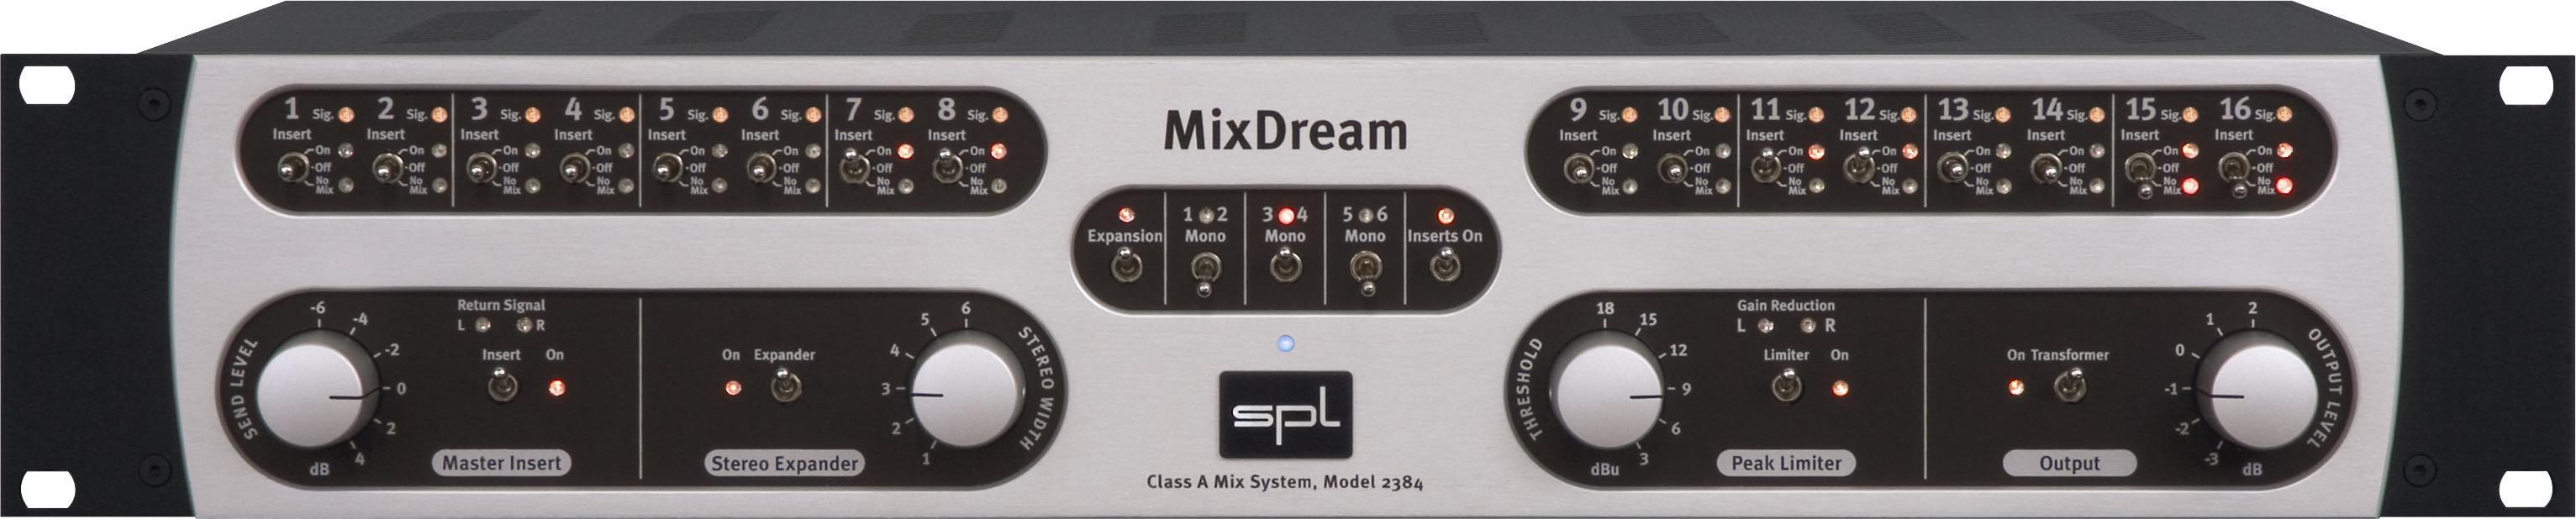 SPL MixDream analog sum sommatore hardware outboard pro studio midi music mix mastering audiofader